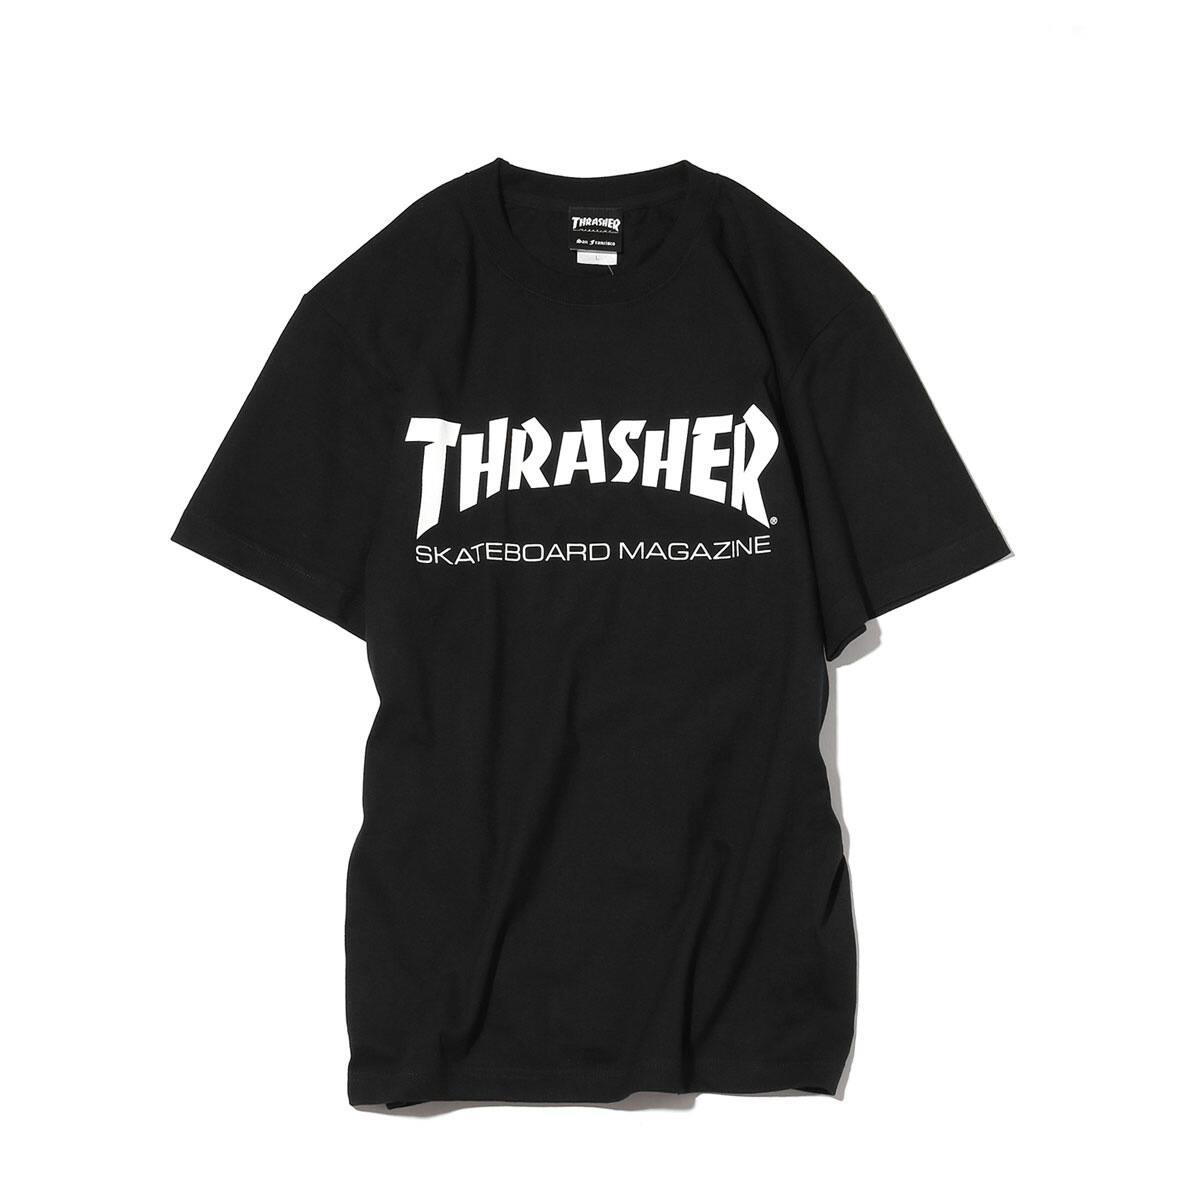 THRASHER MAG LOGO T-SHIRTWHITE/BLACK/RED 18FW-I_photo_large